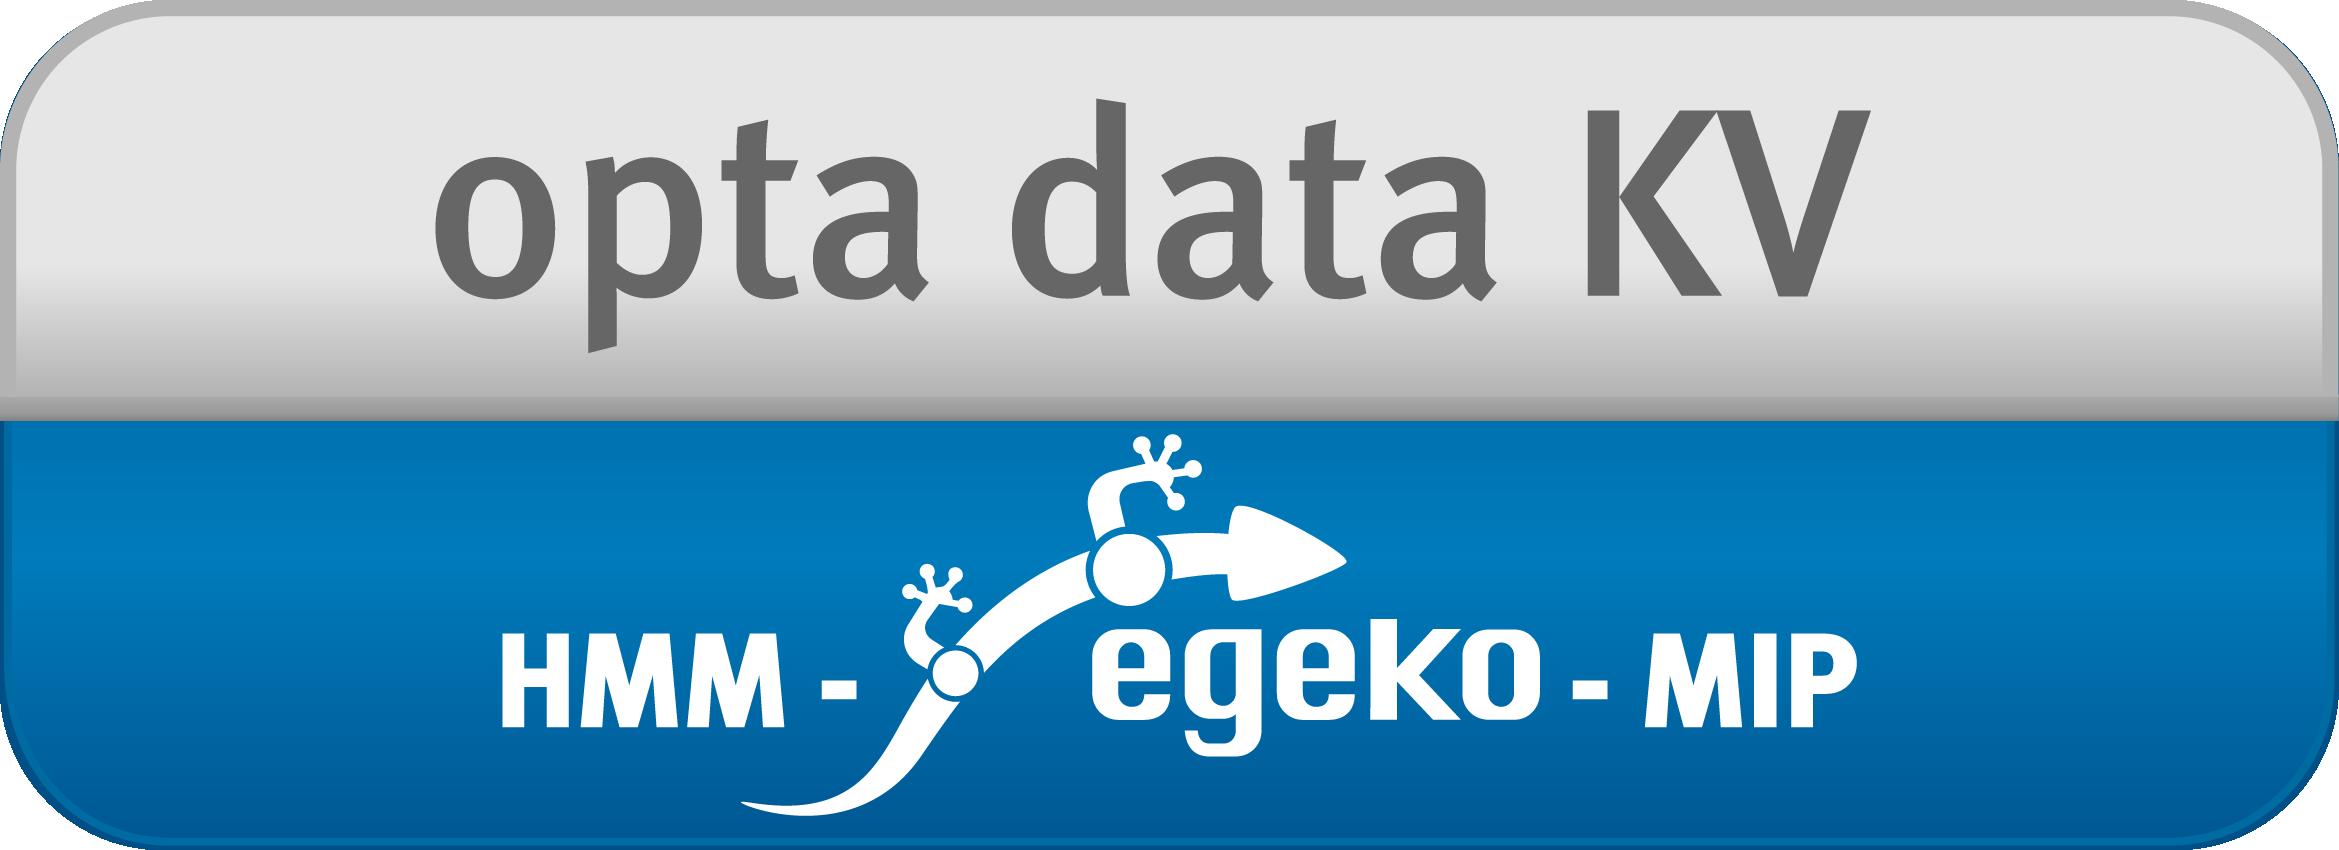 opta data KV